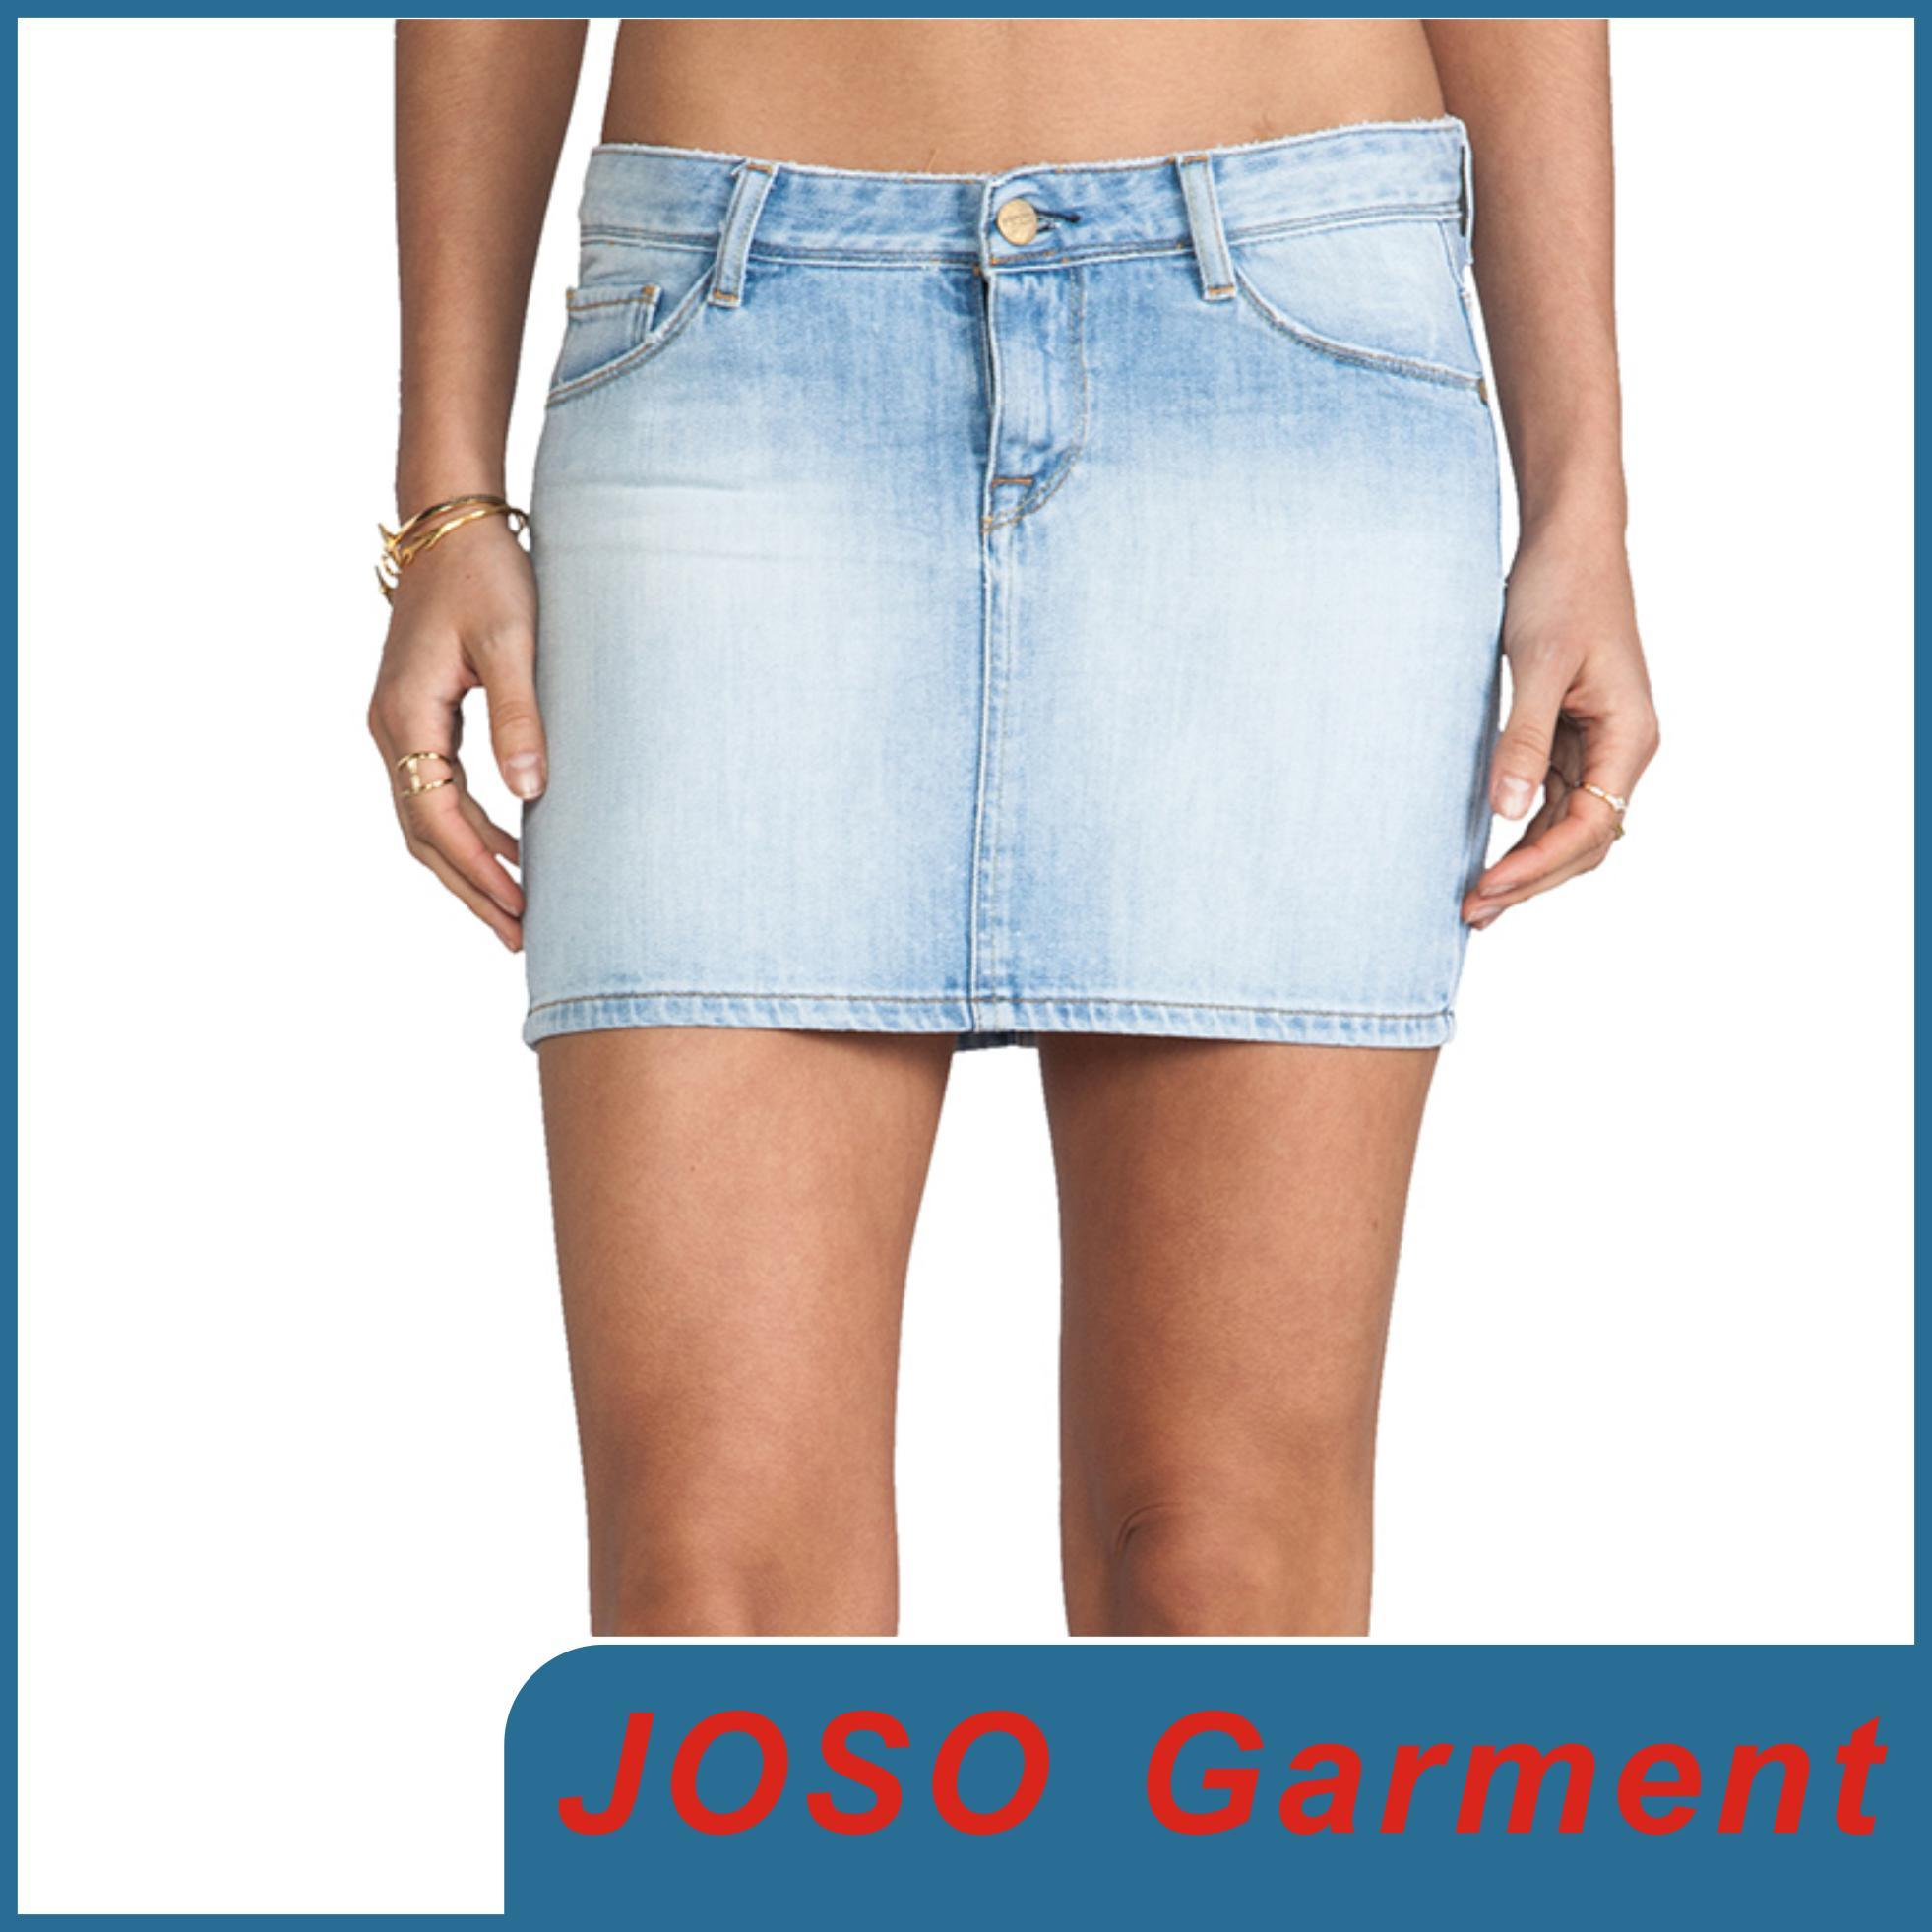 Women Skirts - JOSO (Shuncheng) Garment Co., Ltd. - page 1.